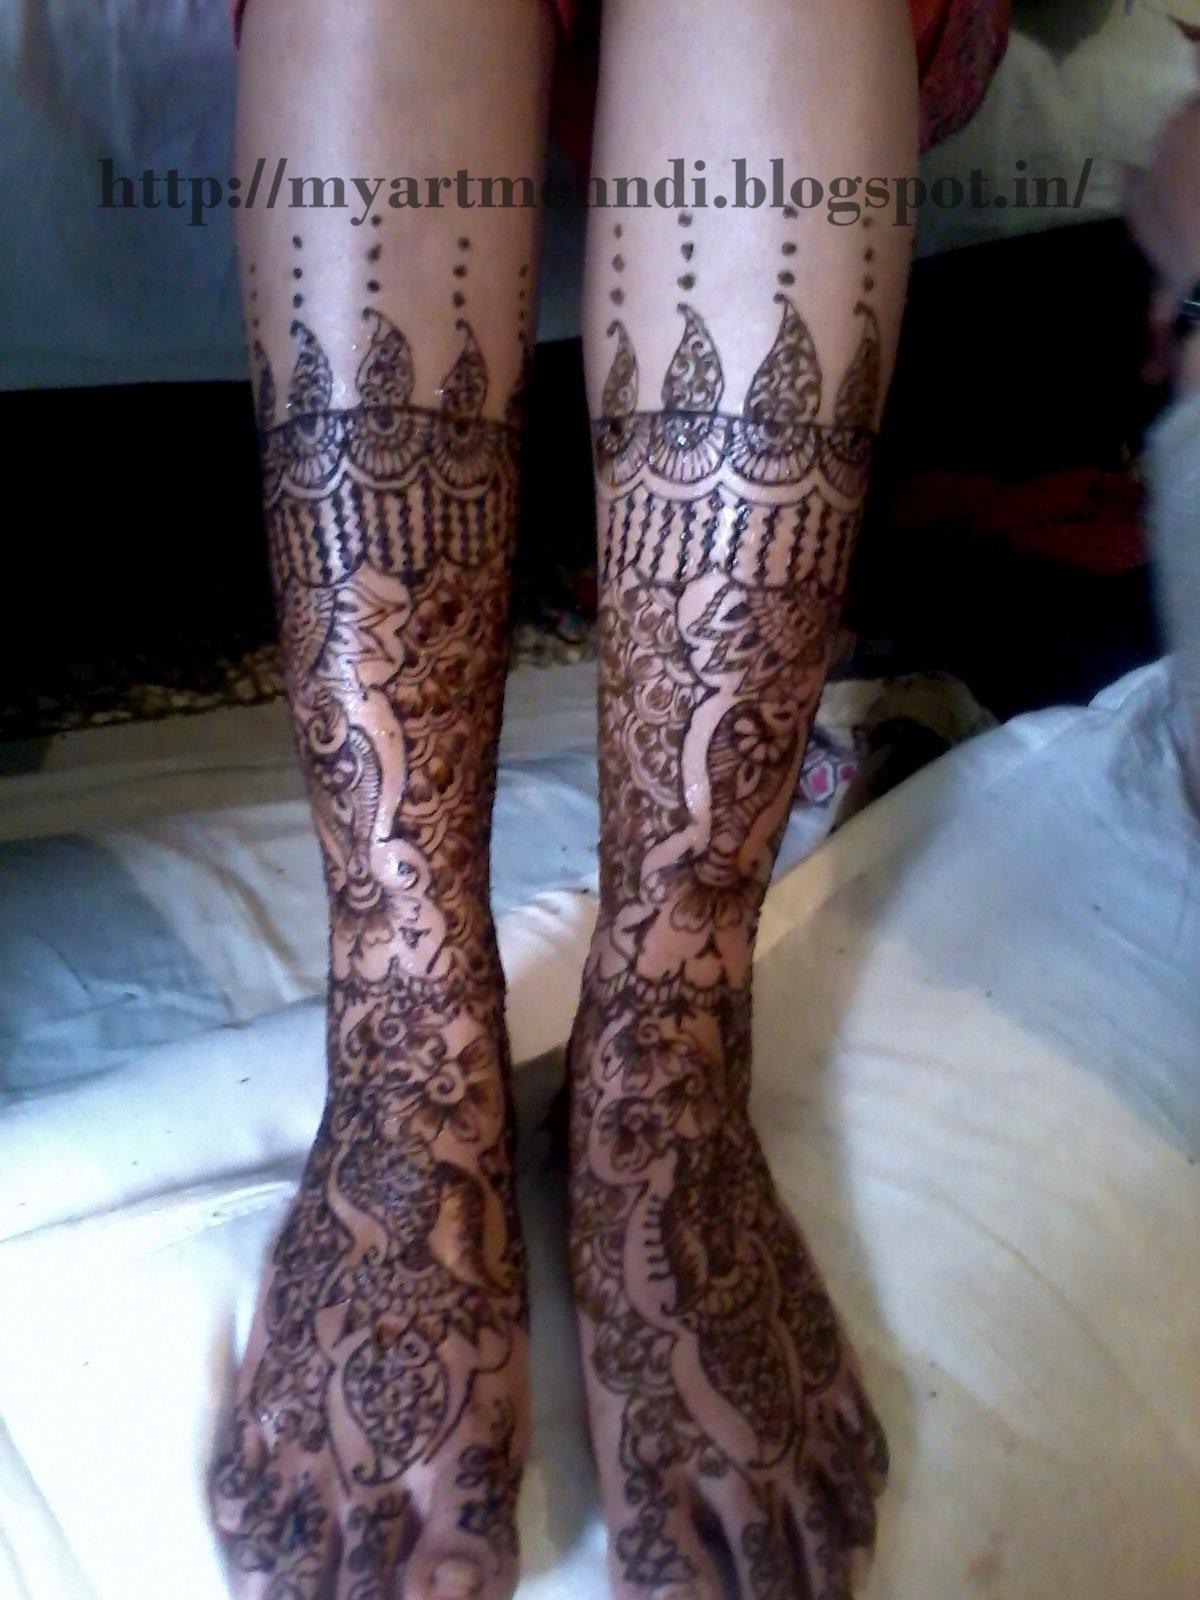 Bridal Mehndi Leg Designs : Mehndidesigns bridal mehndi design for legs